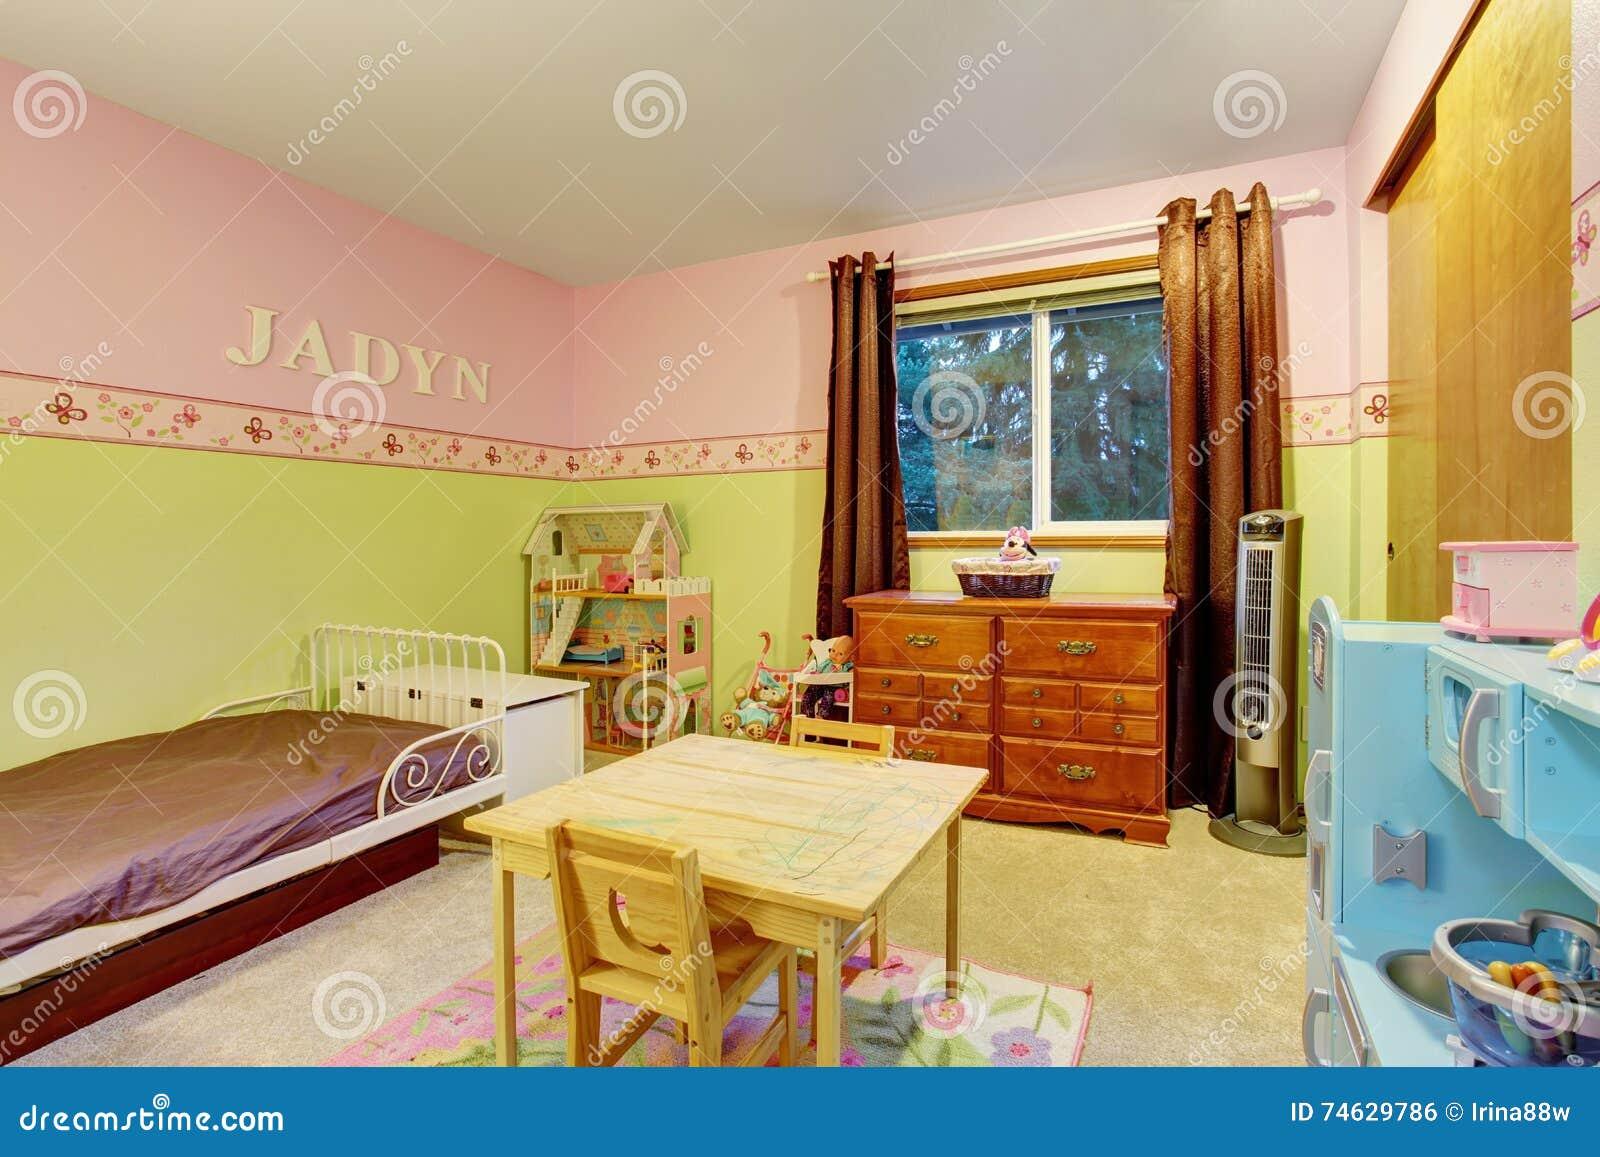 Pitture per camerette bambini shelving cameretta per for Pittura pareti cameretta bambini immagini